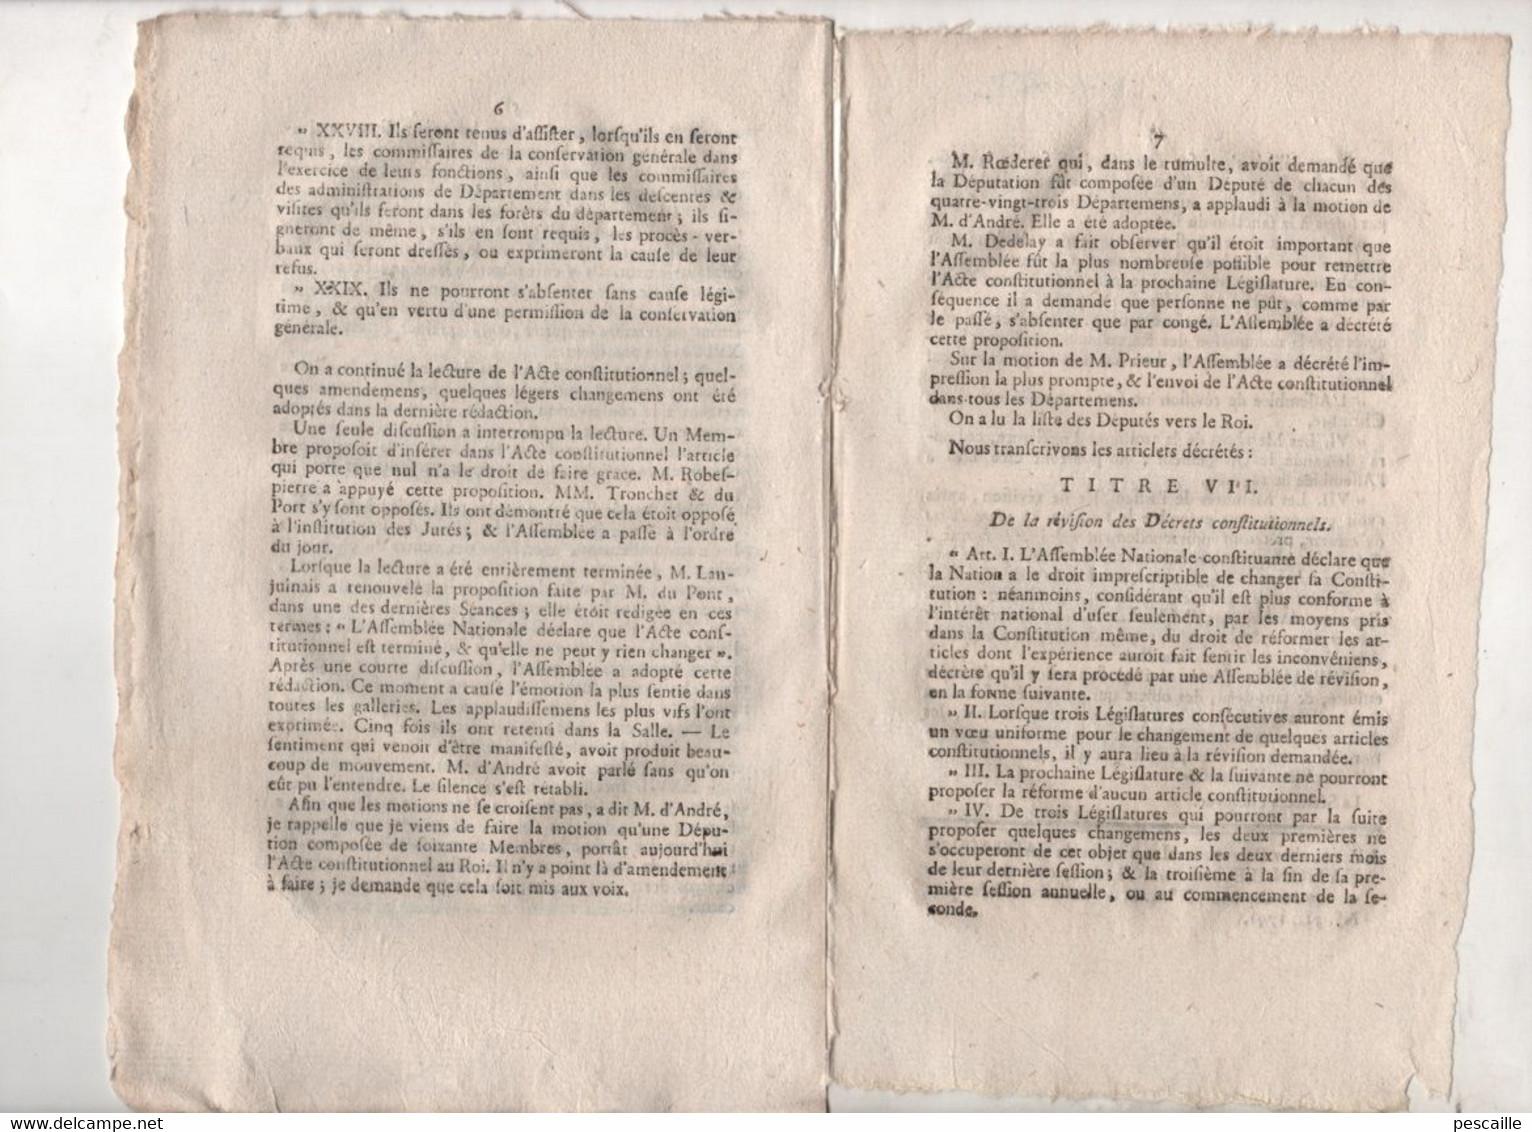 REVOLUTION FRANCAISE - JOURNAL DES DEBATS 03 09 1791 - MILITAIRES PONDICHERY ILE DE FRANCE  ( MAURICE ) - BOIS & FORETS - Newspapers - Before 1800